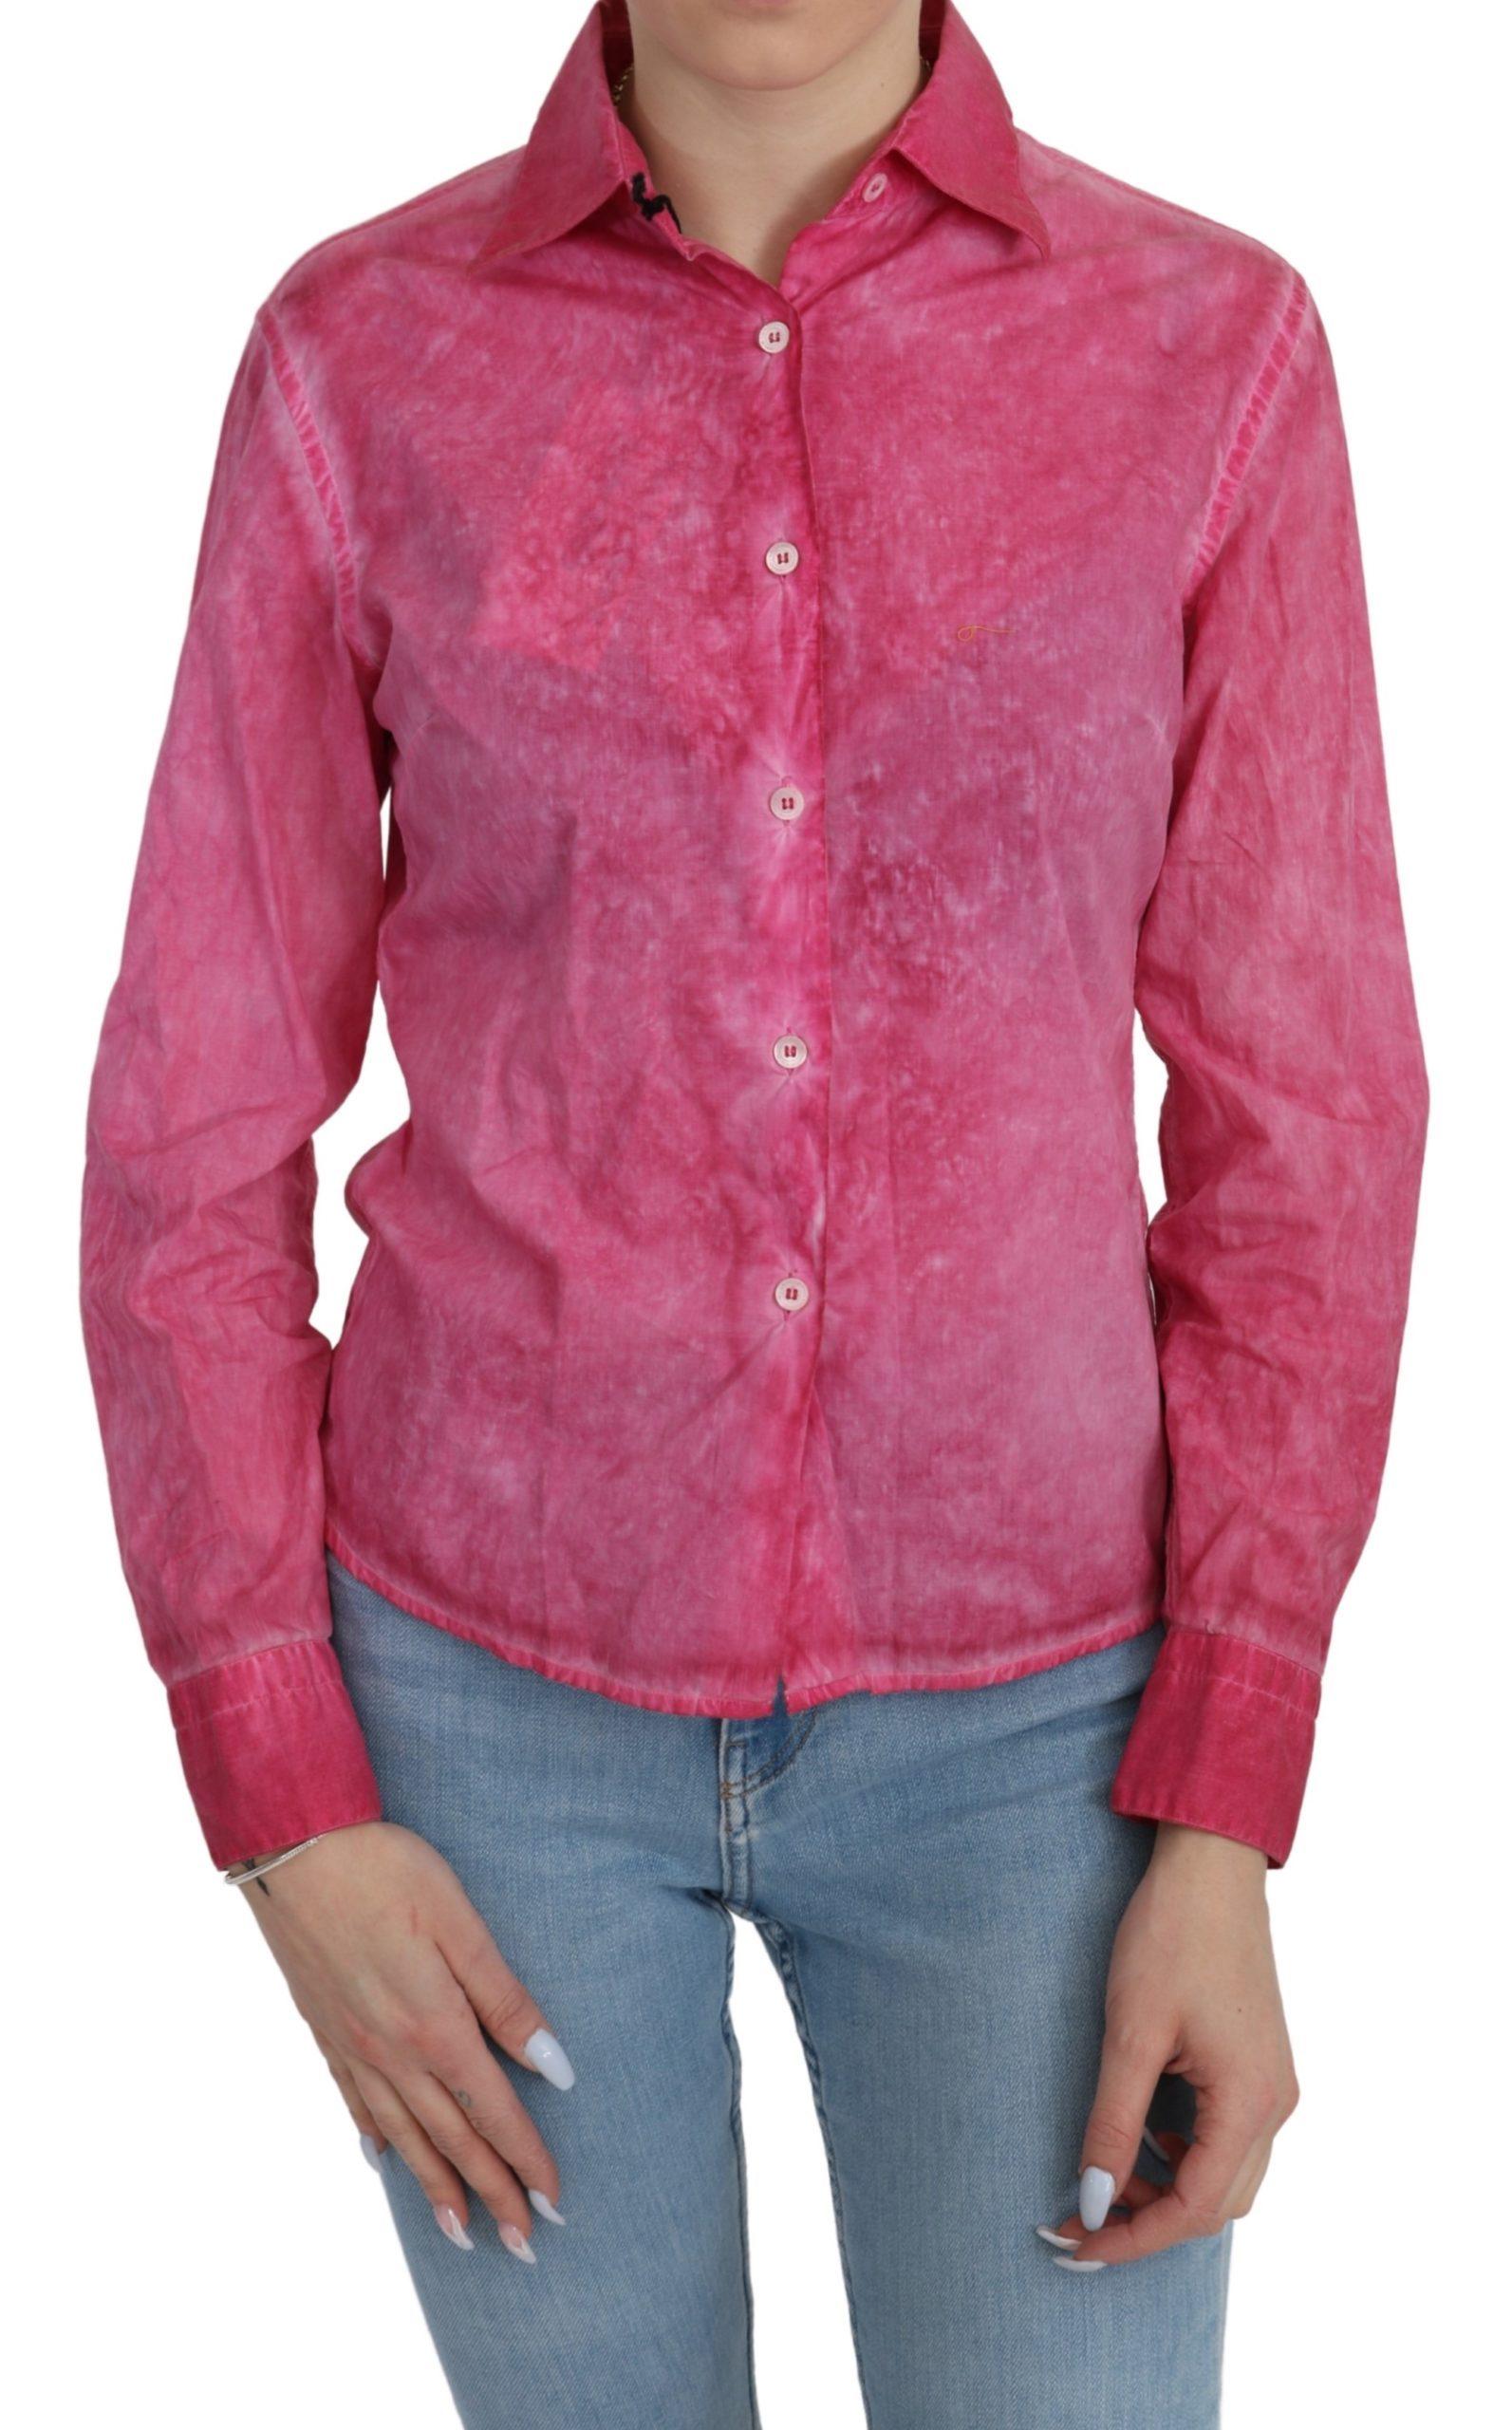 Ermanno Scervino Women's Collared LS Shirt Pink TSH4881 - IT42 M